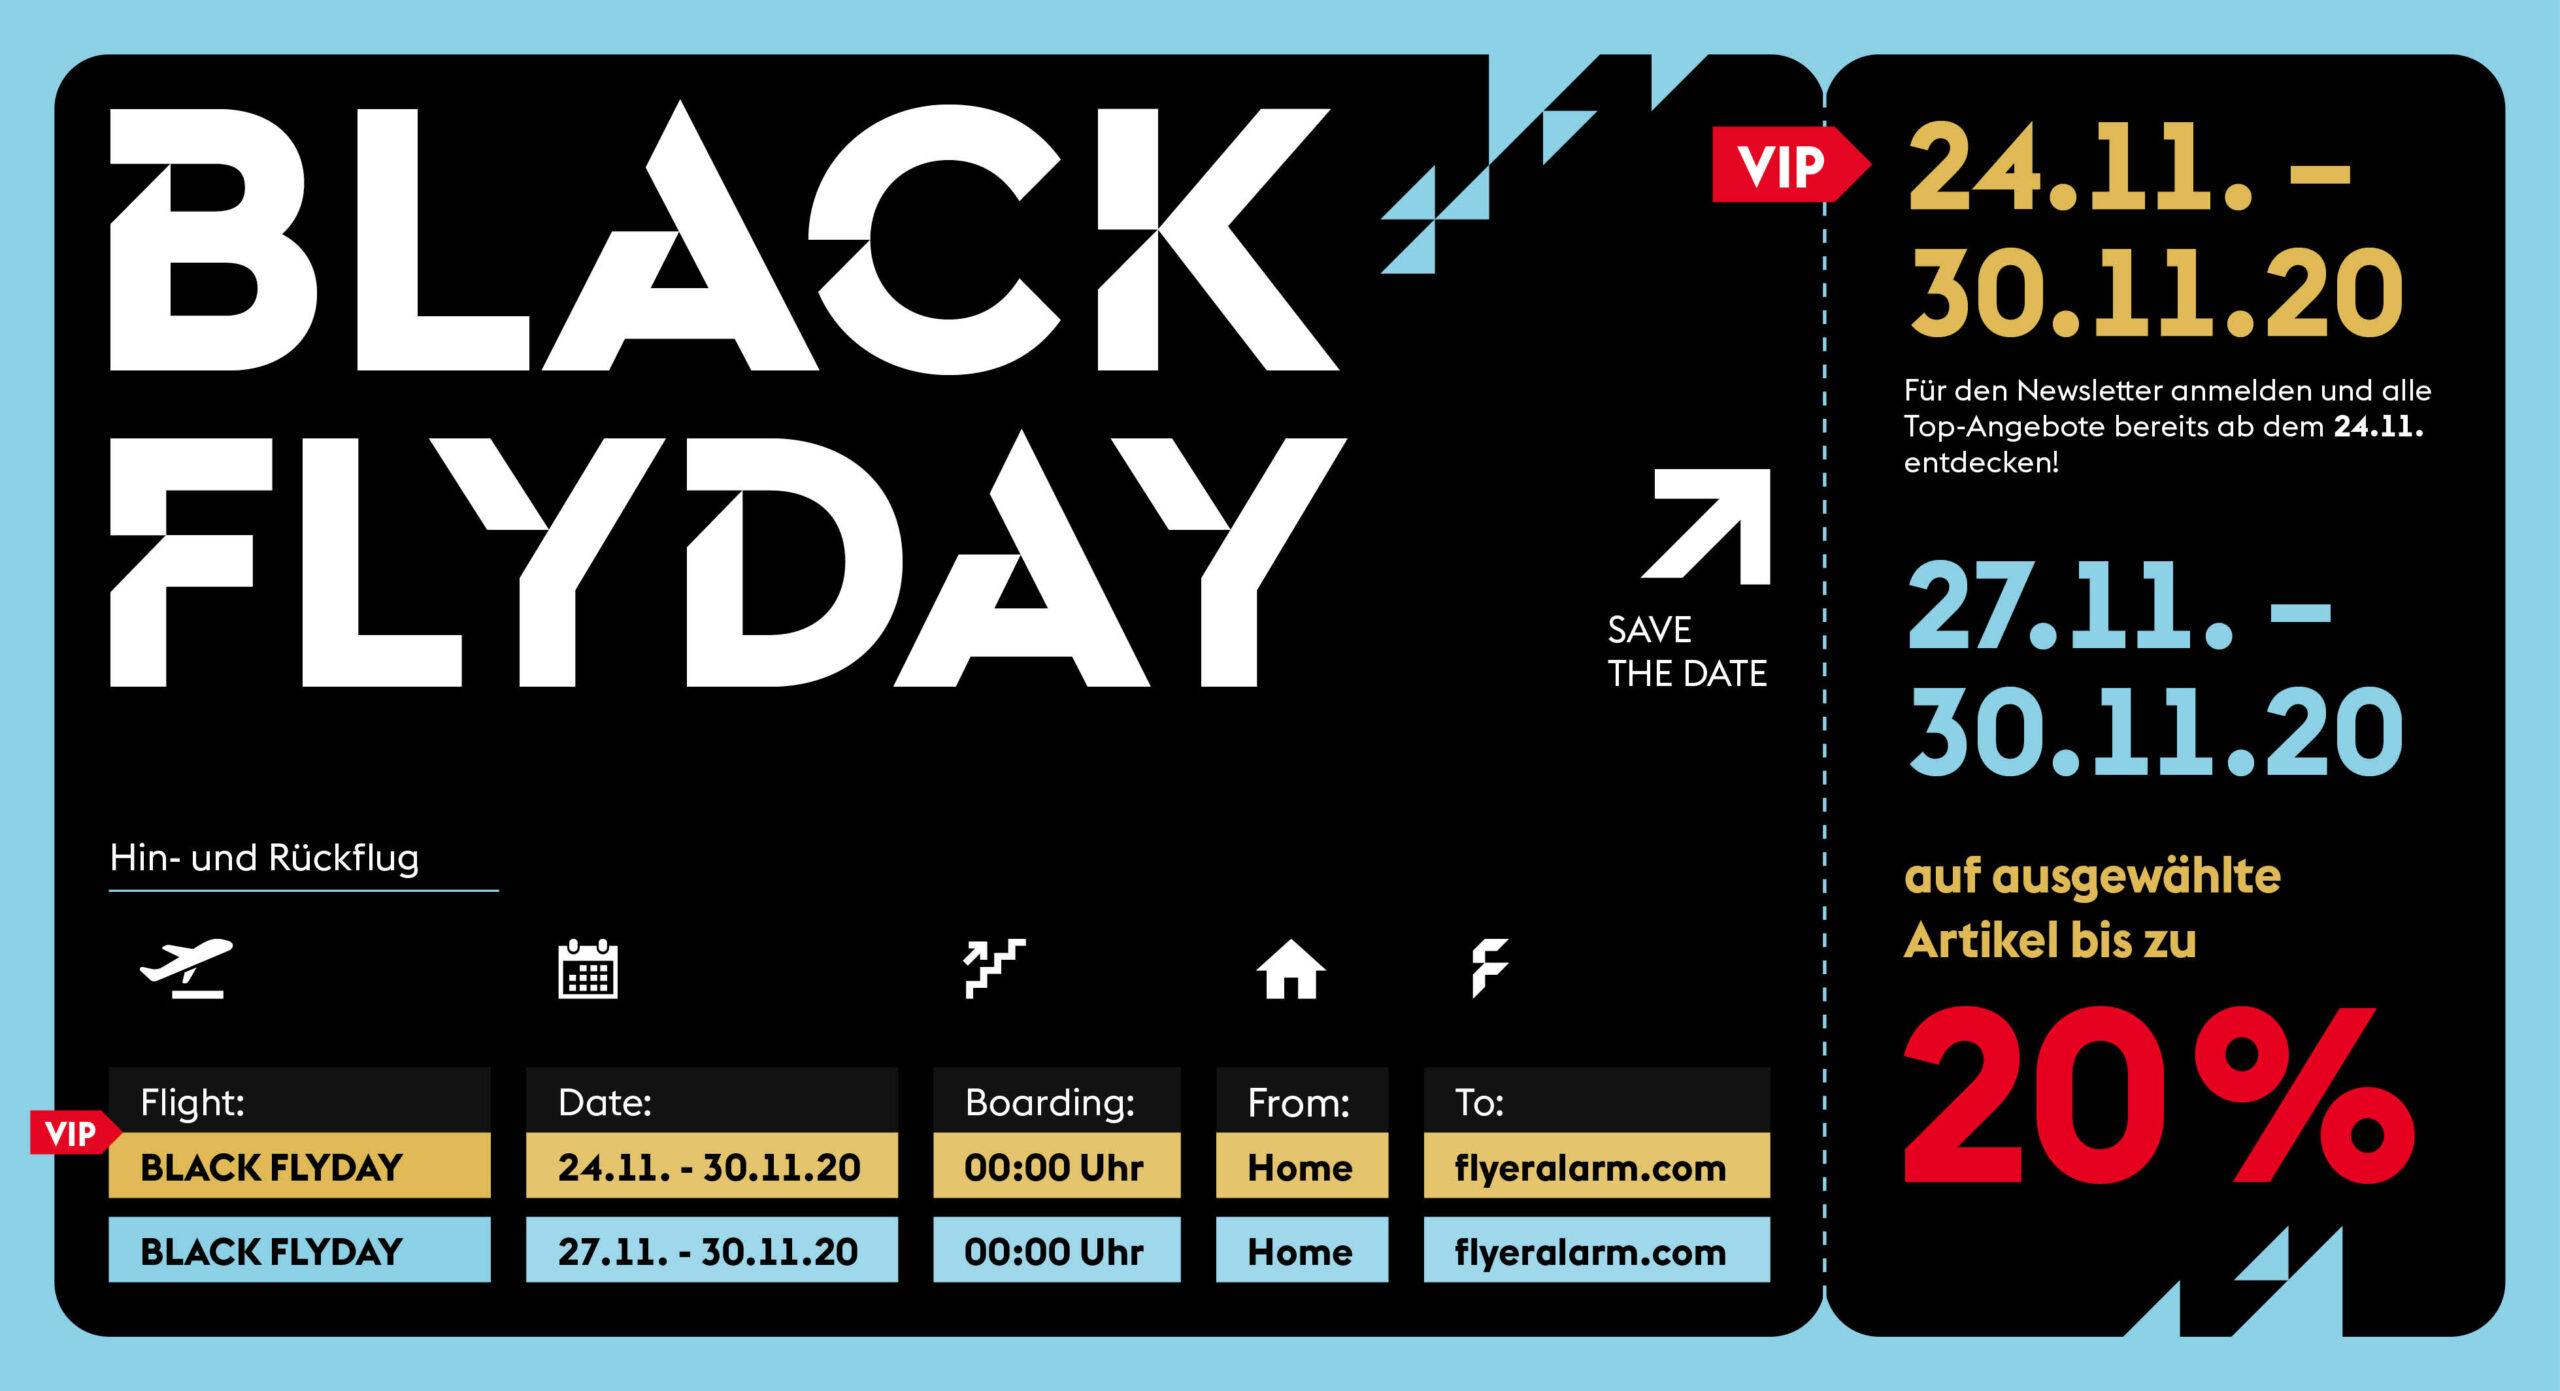 Black Friday Aktion bei FLYERALARM: 20 % Rabatt